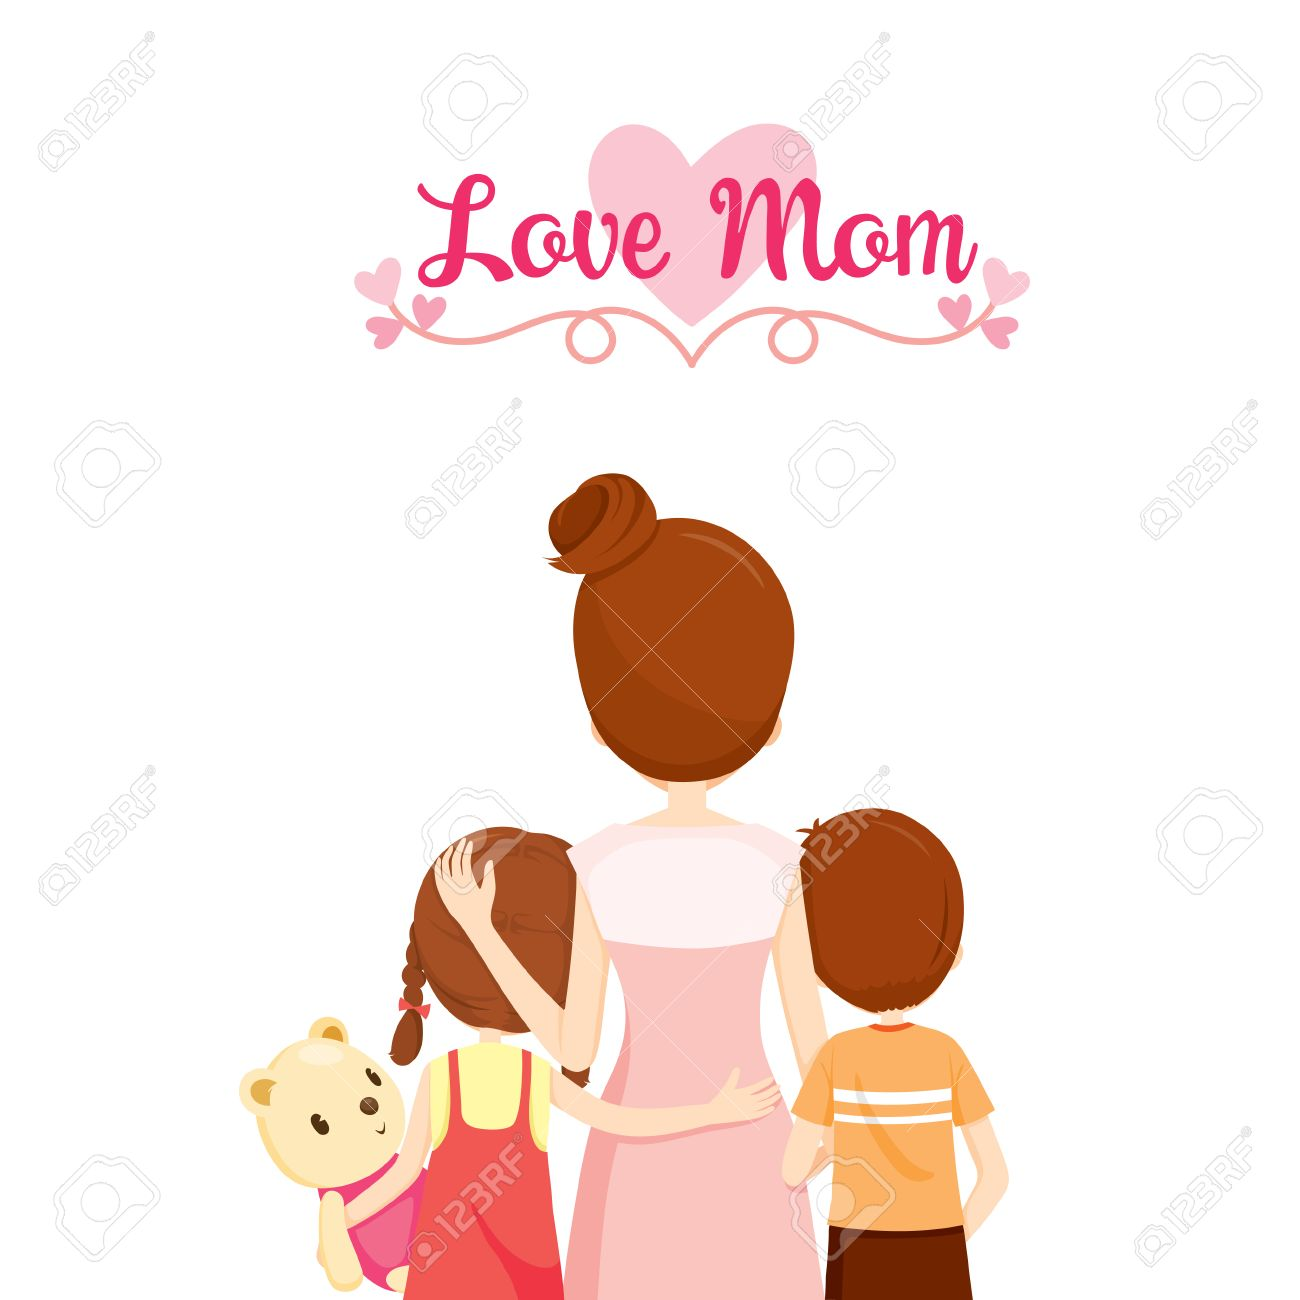 Madre Hijo E Hija Abrazos Juntos Familia Abrazar Abrazos Padres